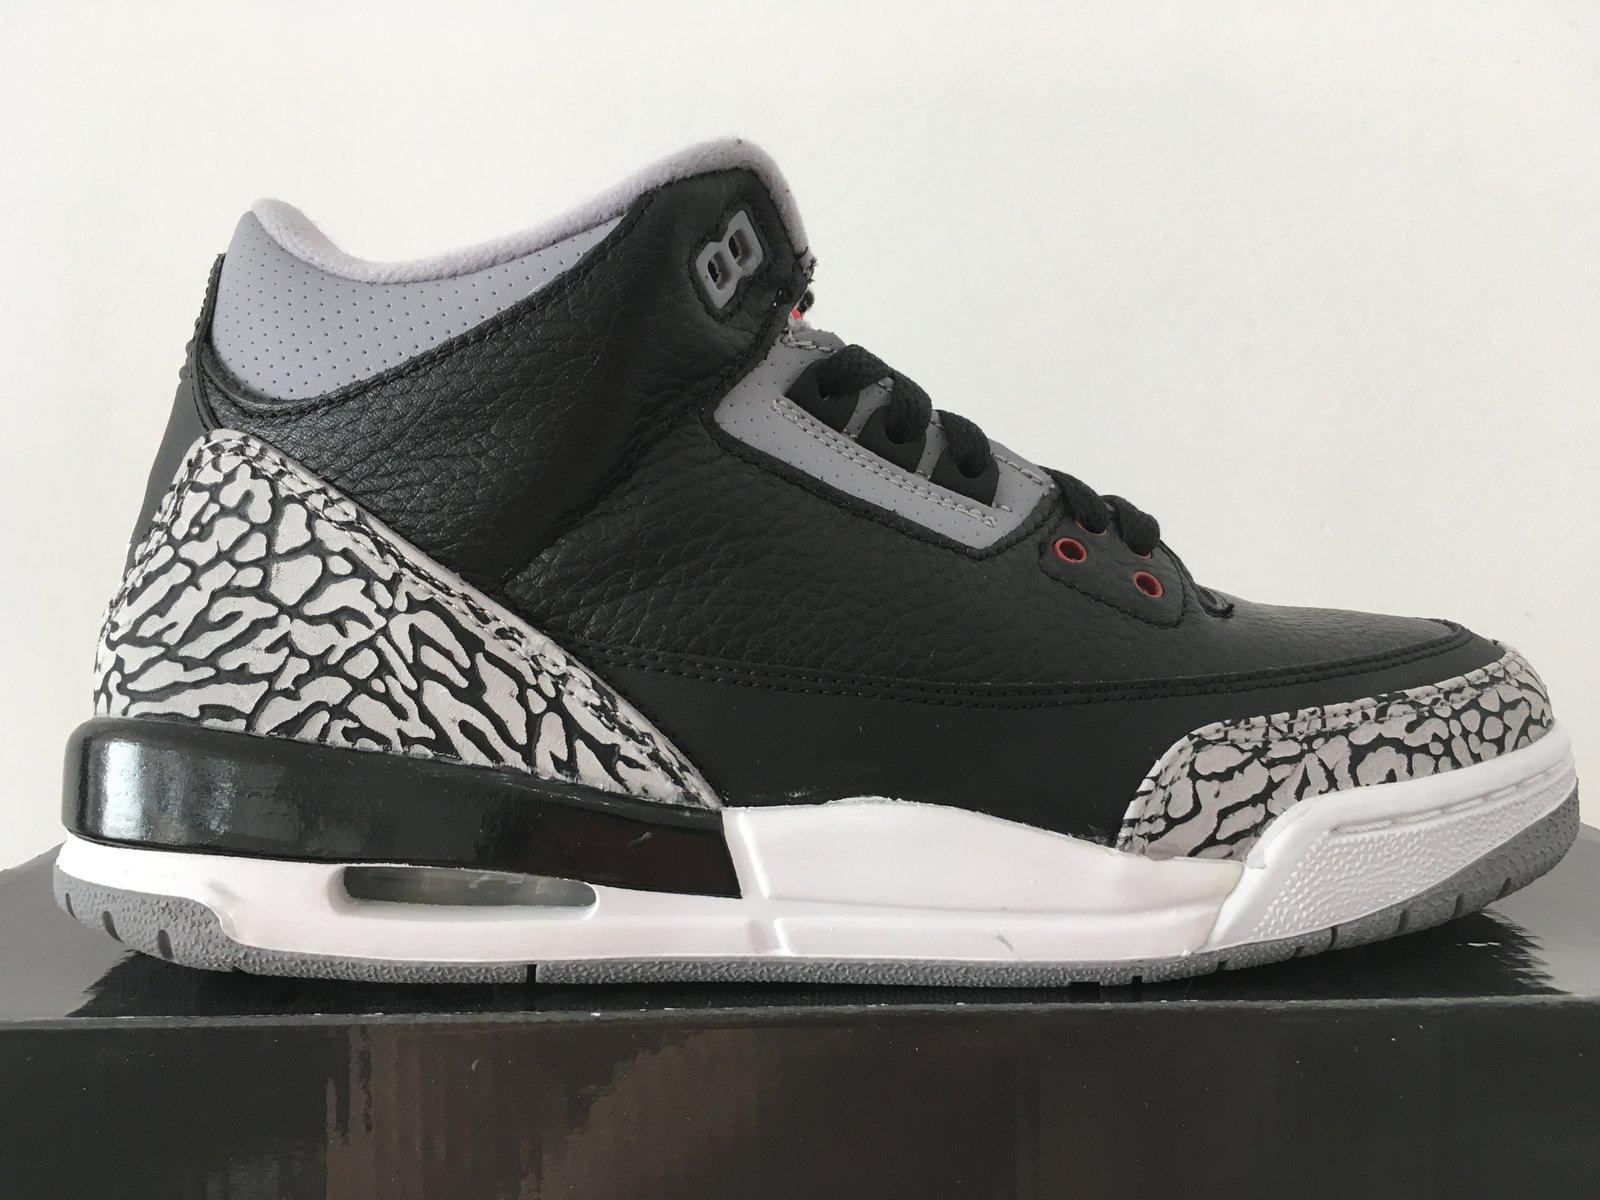 reputable site 90ae2 3efa5 Jordan 3 Black Cement 2011 GS 2011